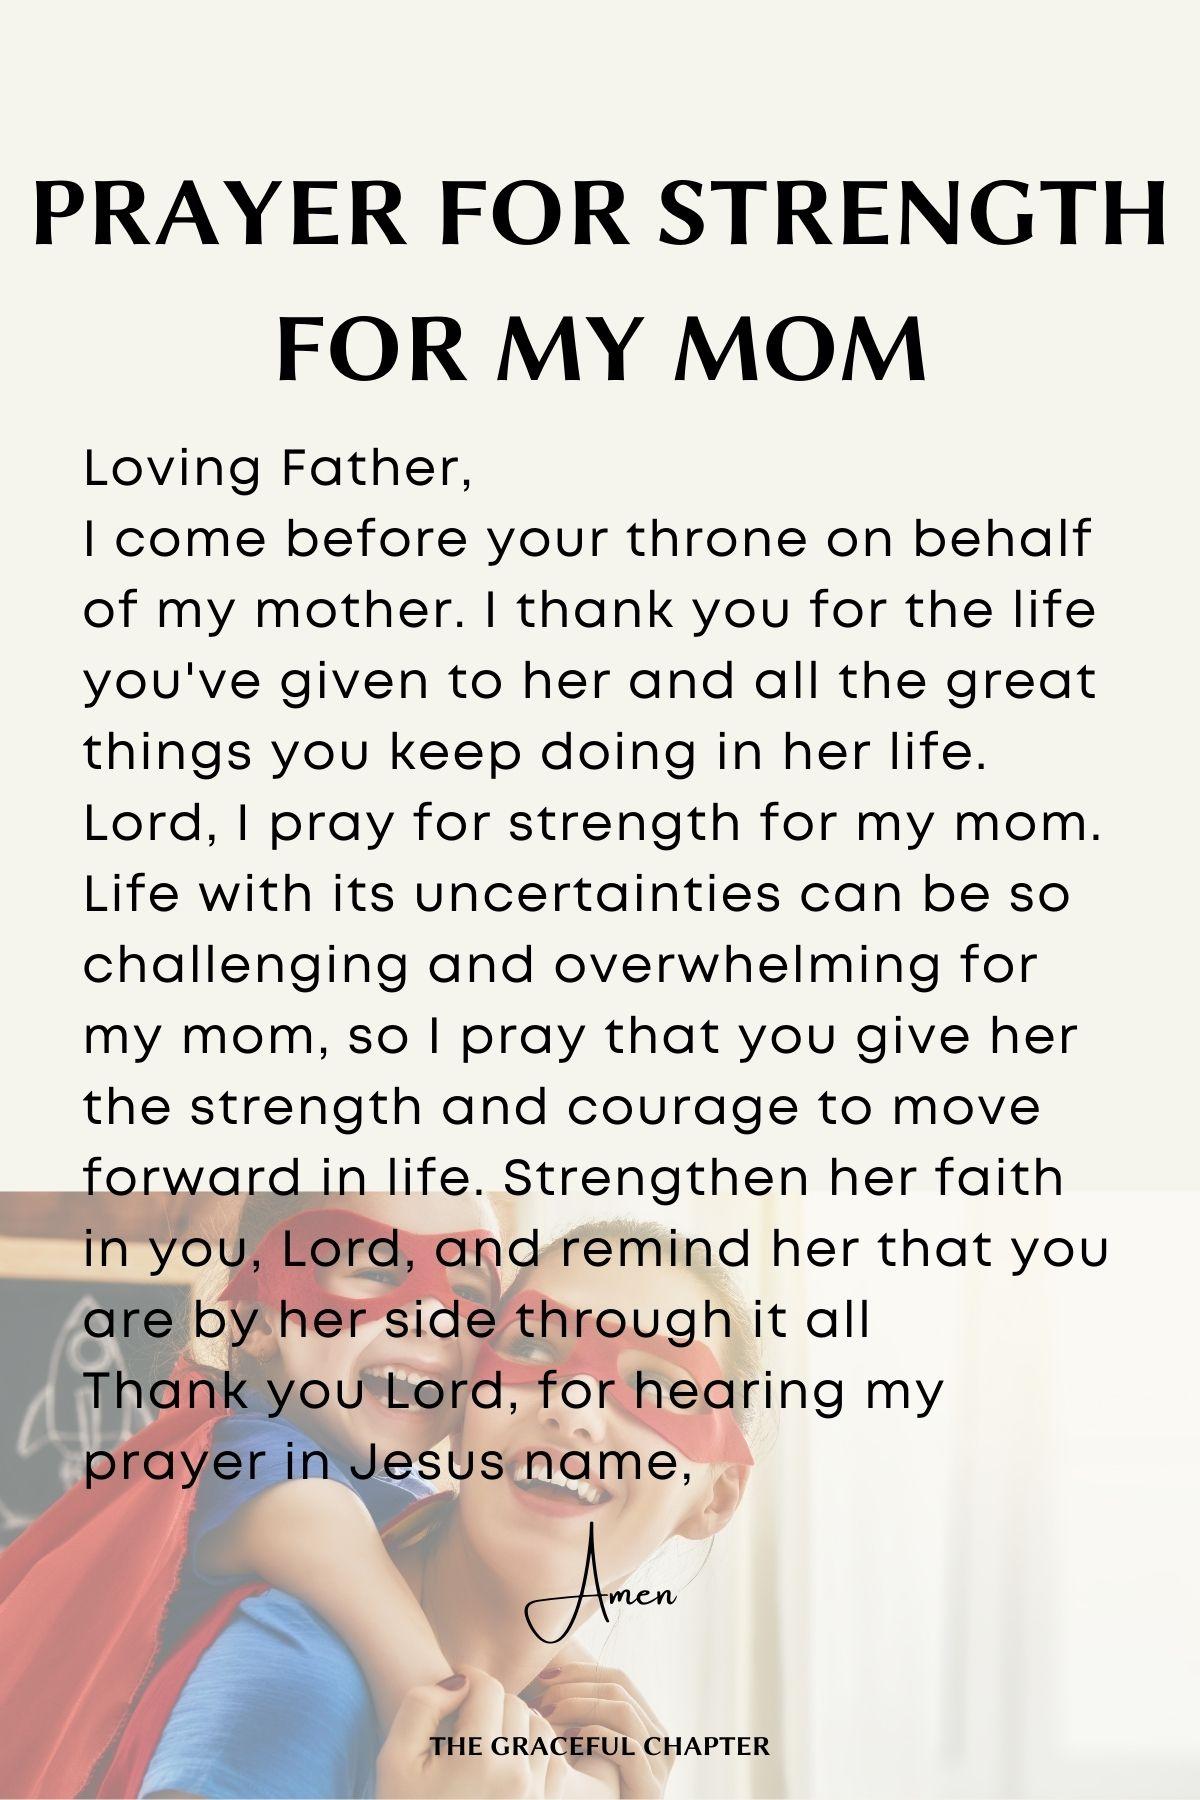 Prayer for strength for my mom